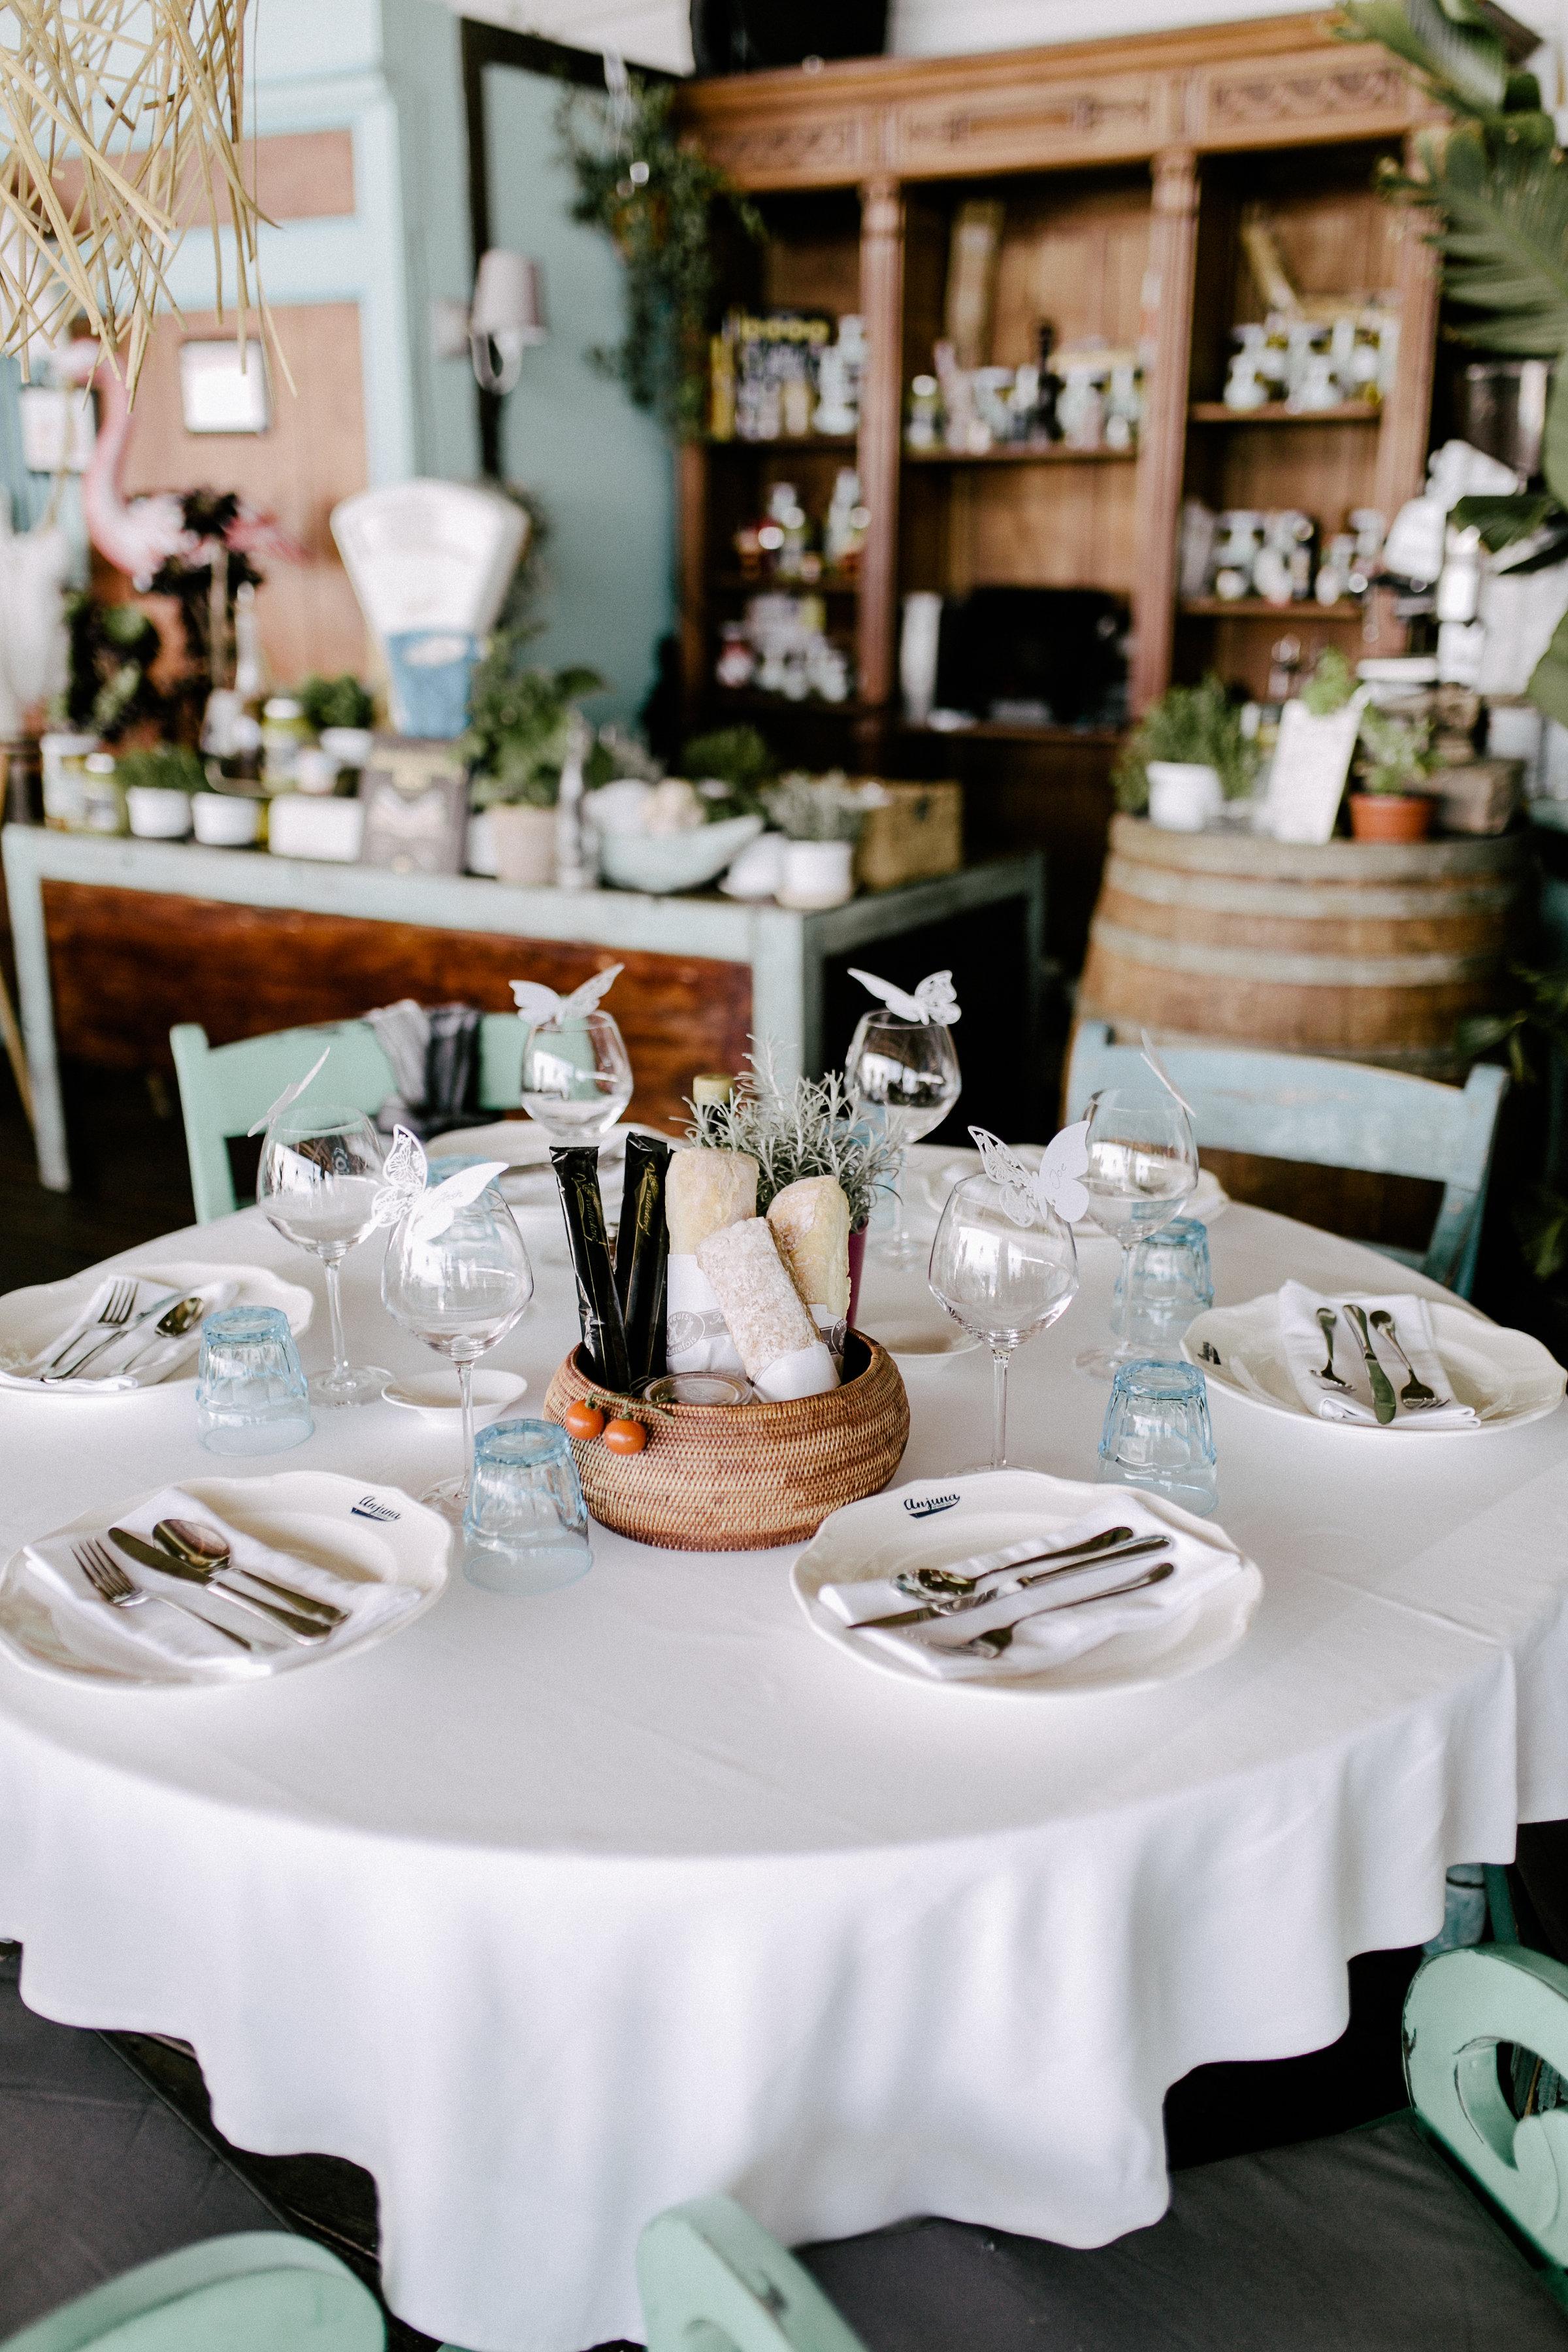 Wedding preparations at Anjuna, a beach restaurant by the Mediterranean Sea.